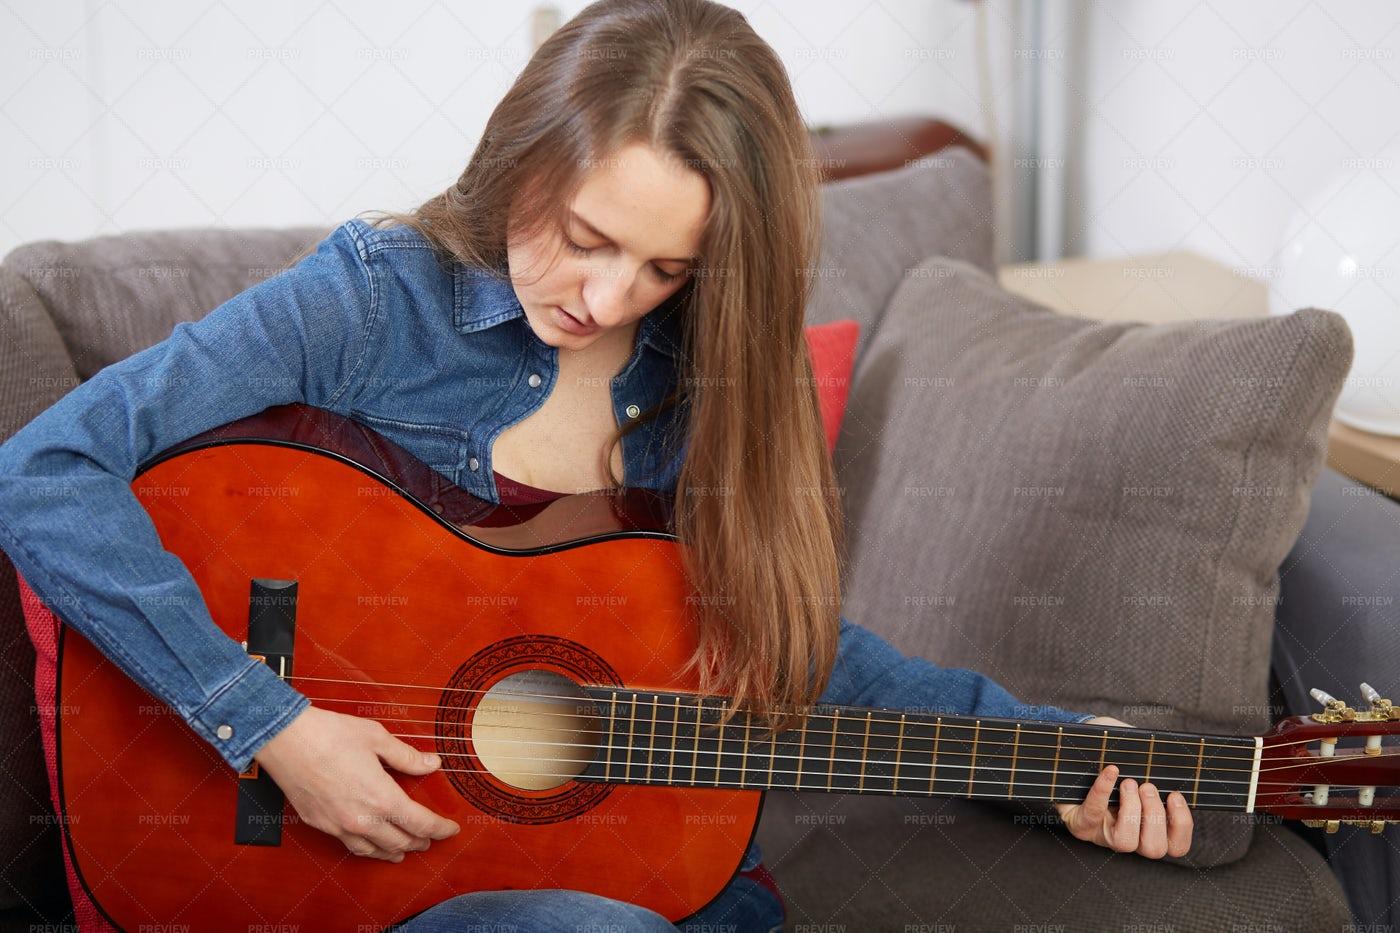 Play Classic Guitar At Home: Stock Photos